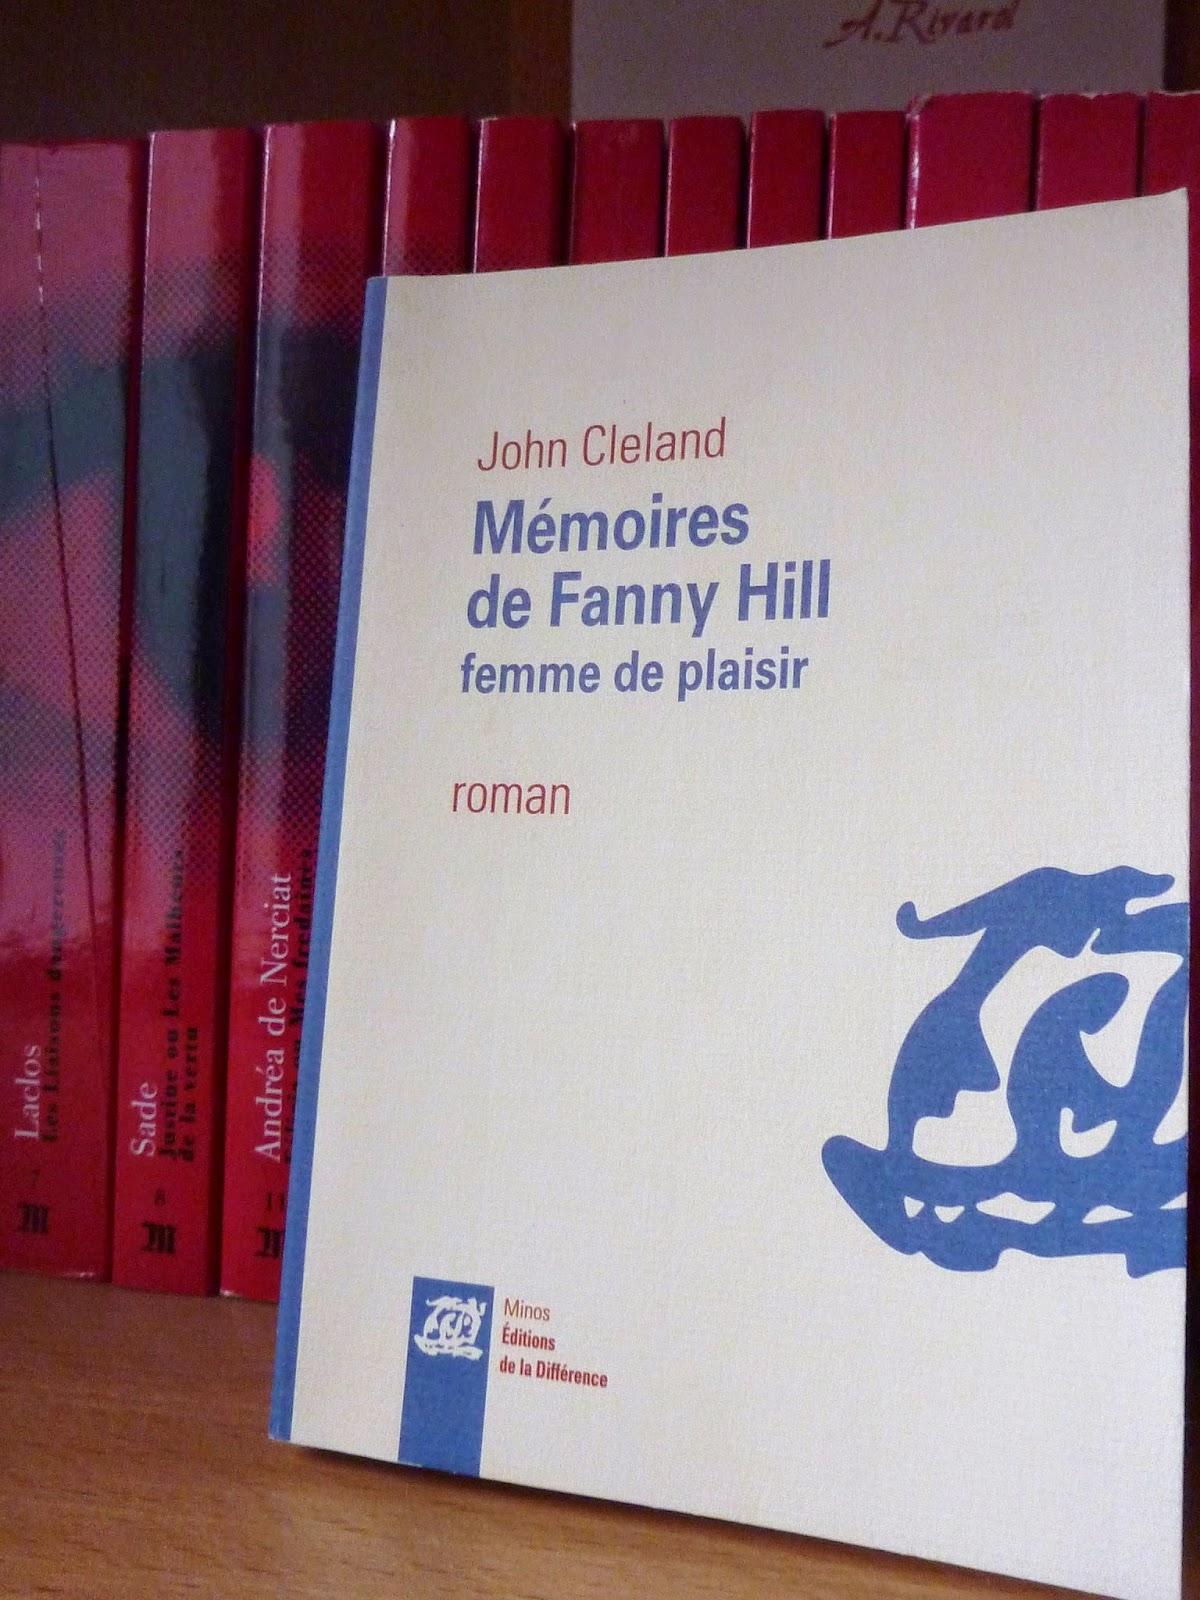 Mémoires de Fanny Hill - John Cleland